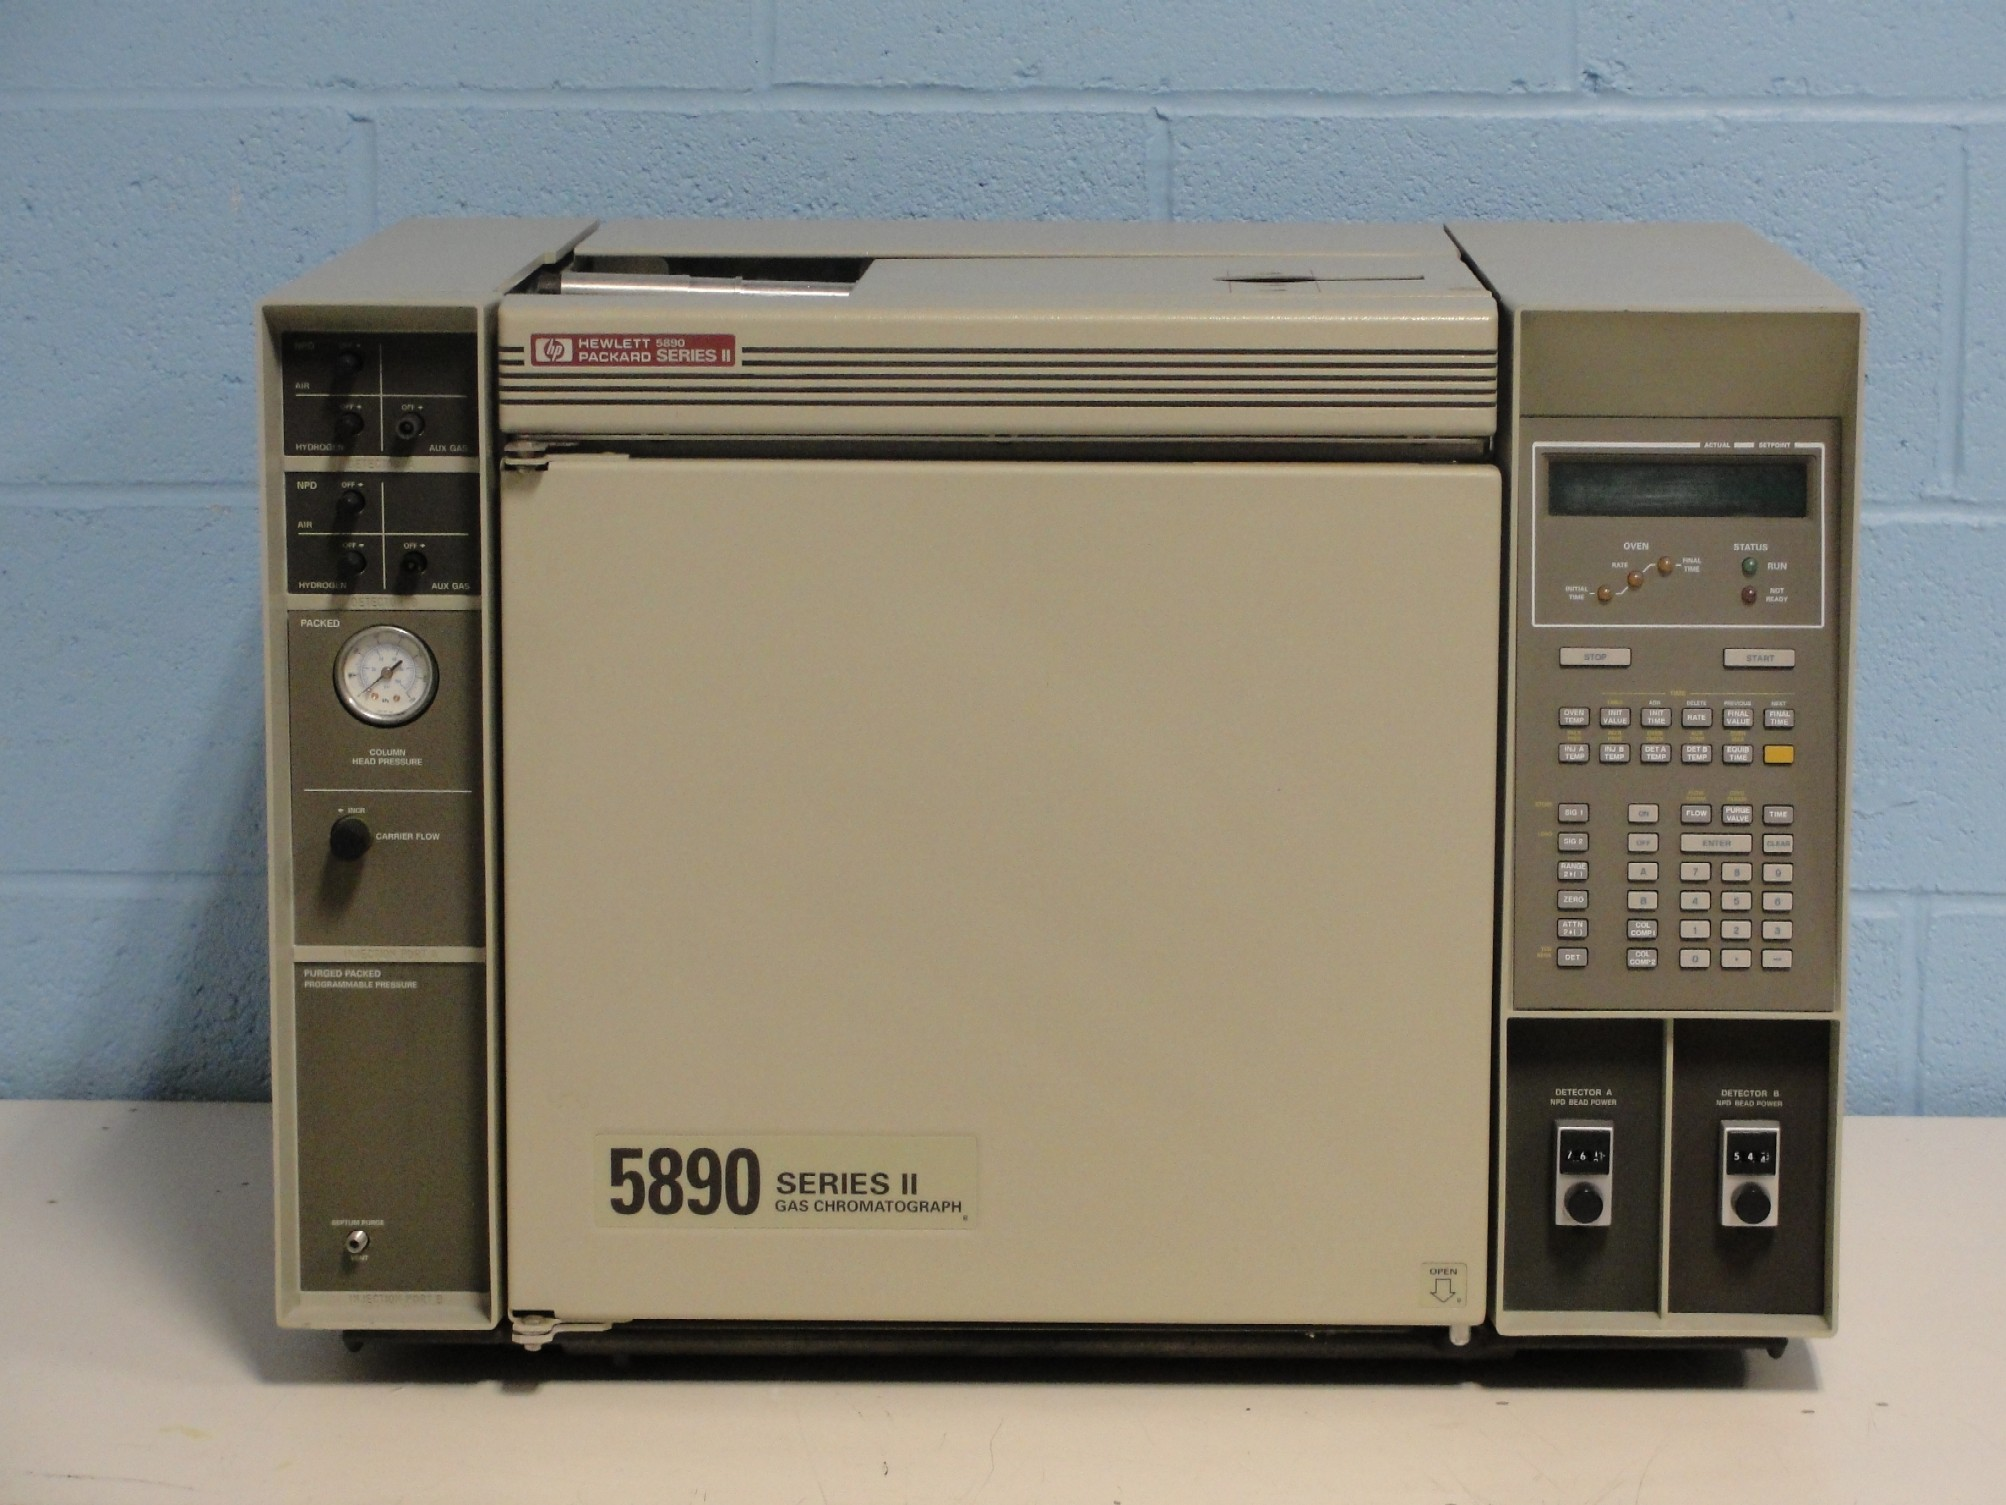 Refurbished Hewlett Packard Gas Chromatograph System